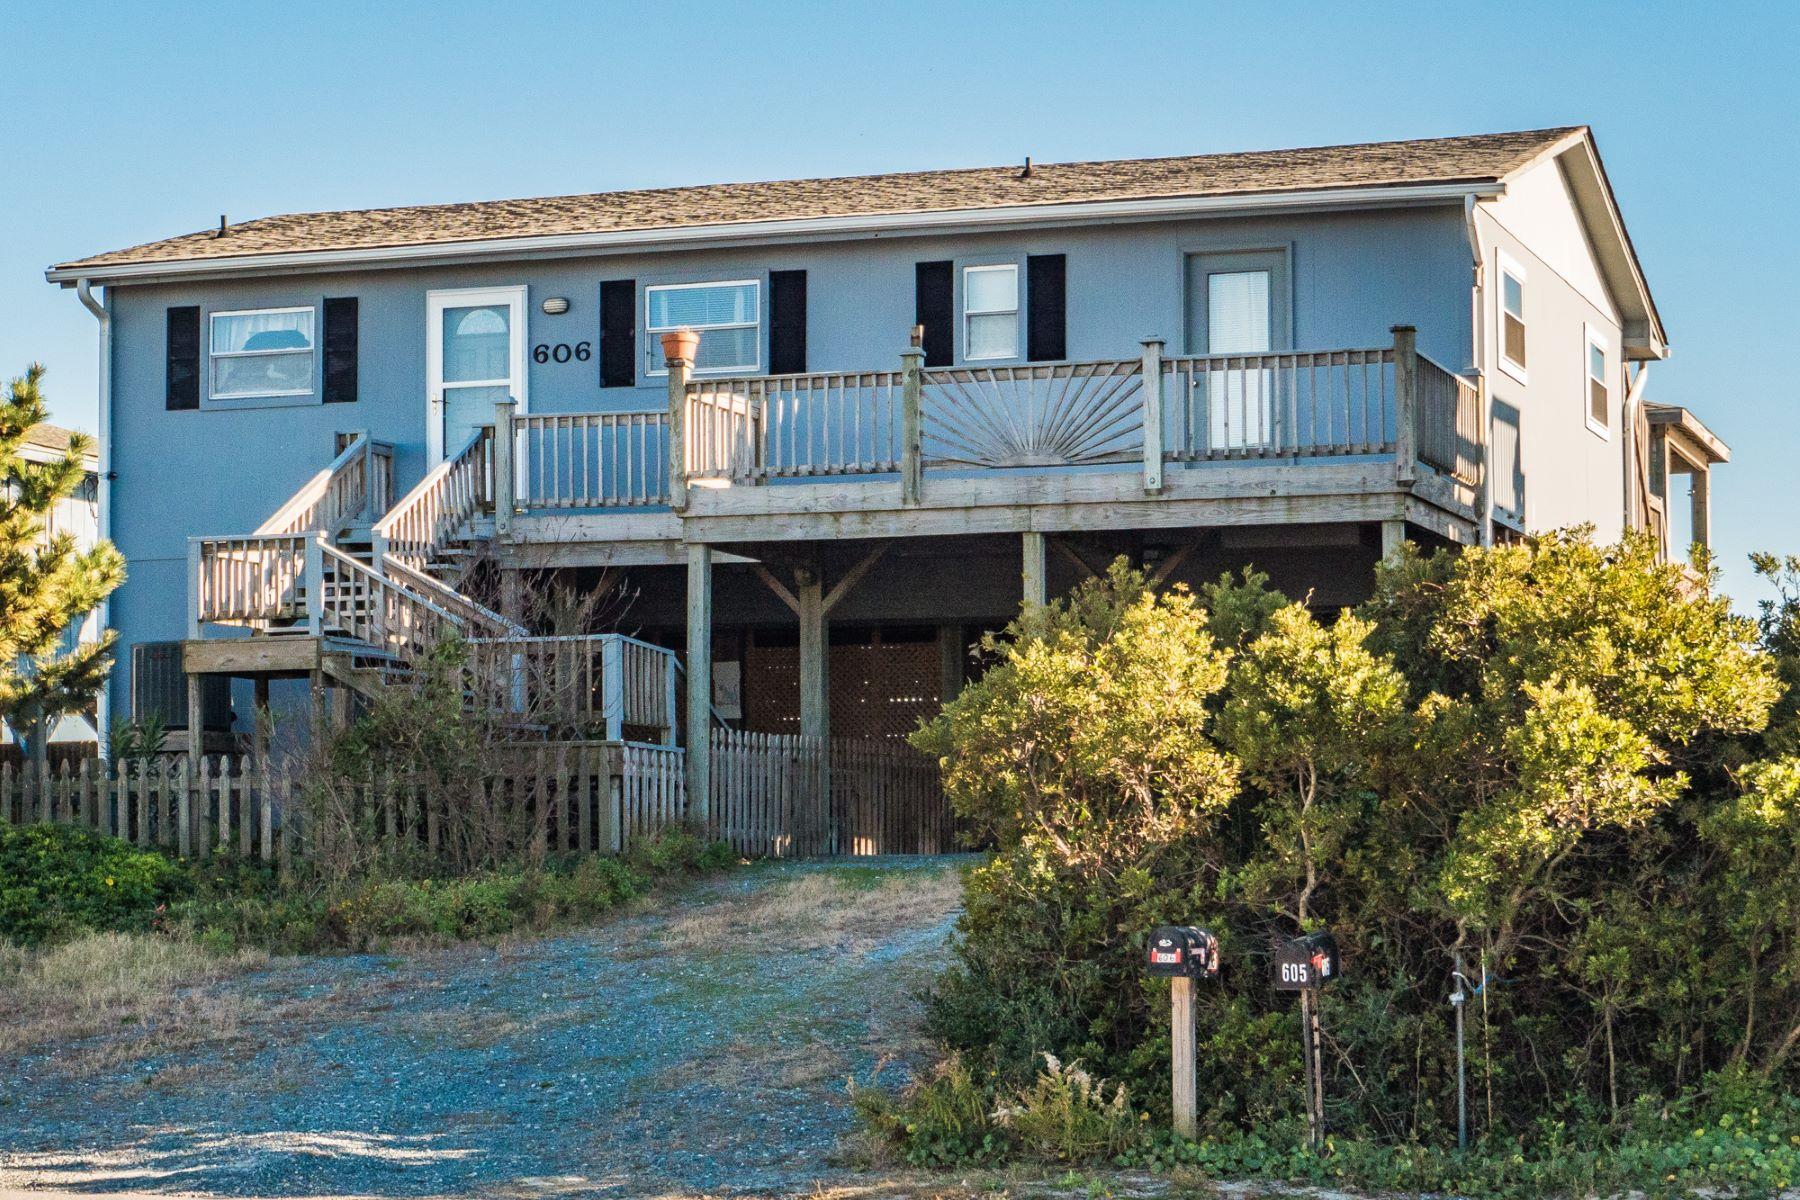 واحد منزل الأسرة للـ Sale في Classic Topsail Beach Cottage 606 N Shore Drive, Surf City, North Carolina, 28445 United States